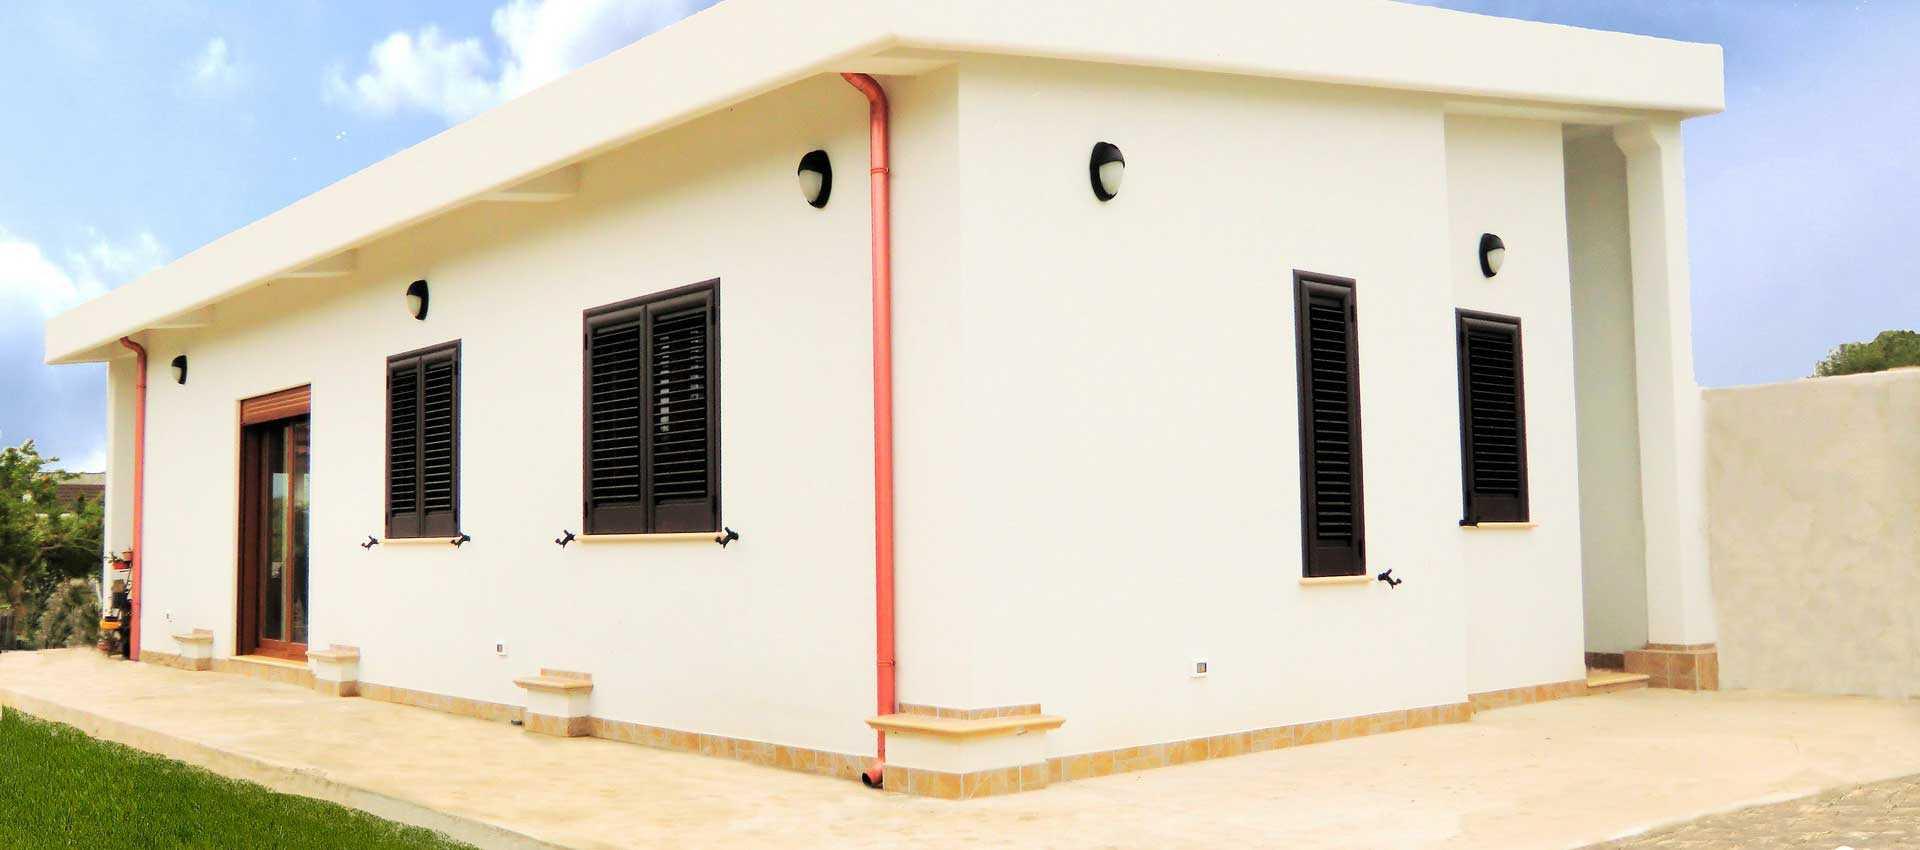 Solicitar presupuesto: Villa Lucia - 4b57c-2c768-74_casa-prefabbricata-villa-lucia.jpg